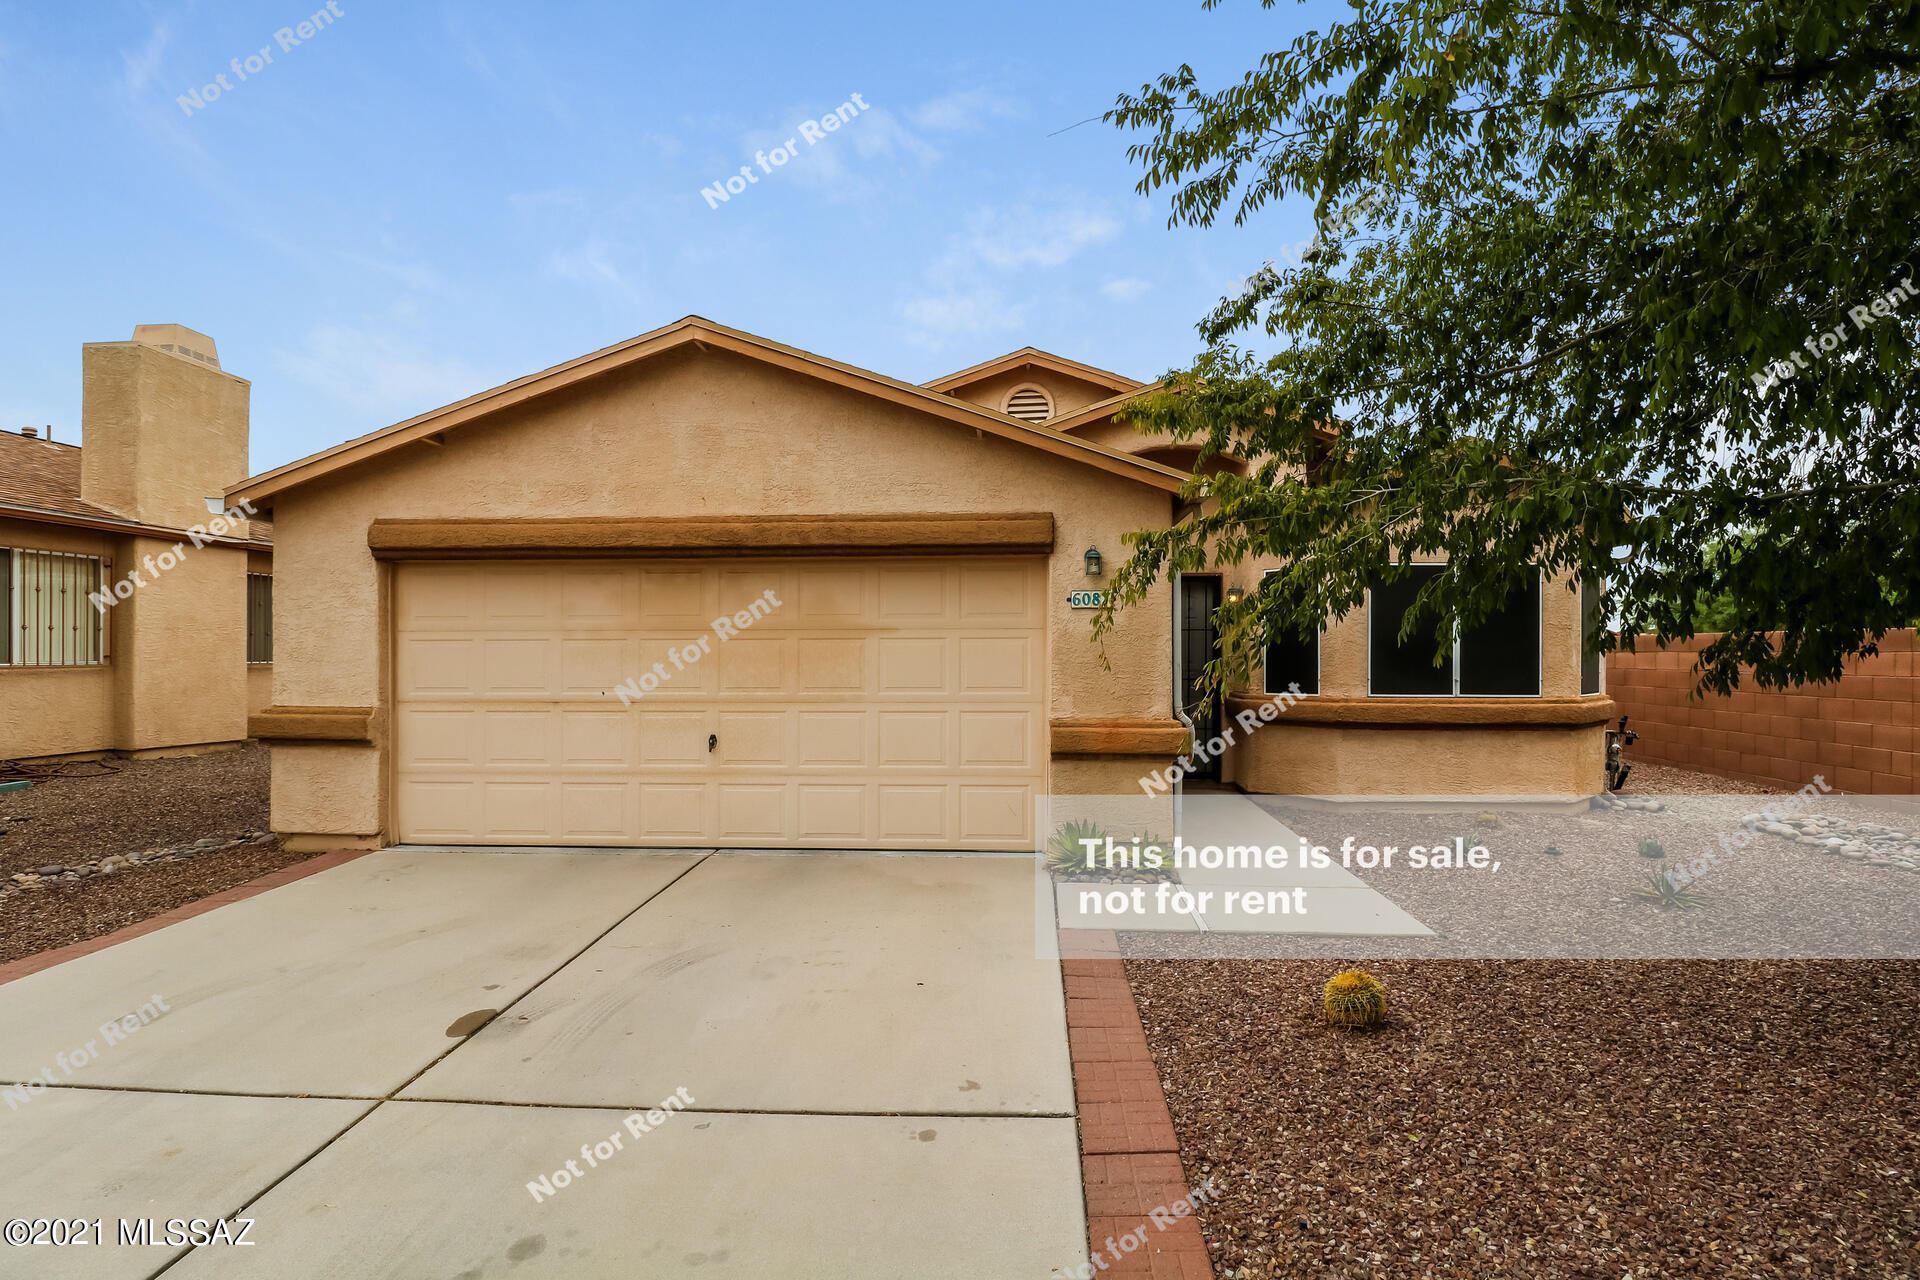 6087 N Applesauce Court, Tucson, AZ 85741 - MLS#: 22116222